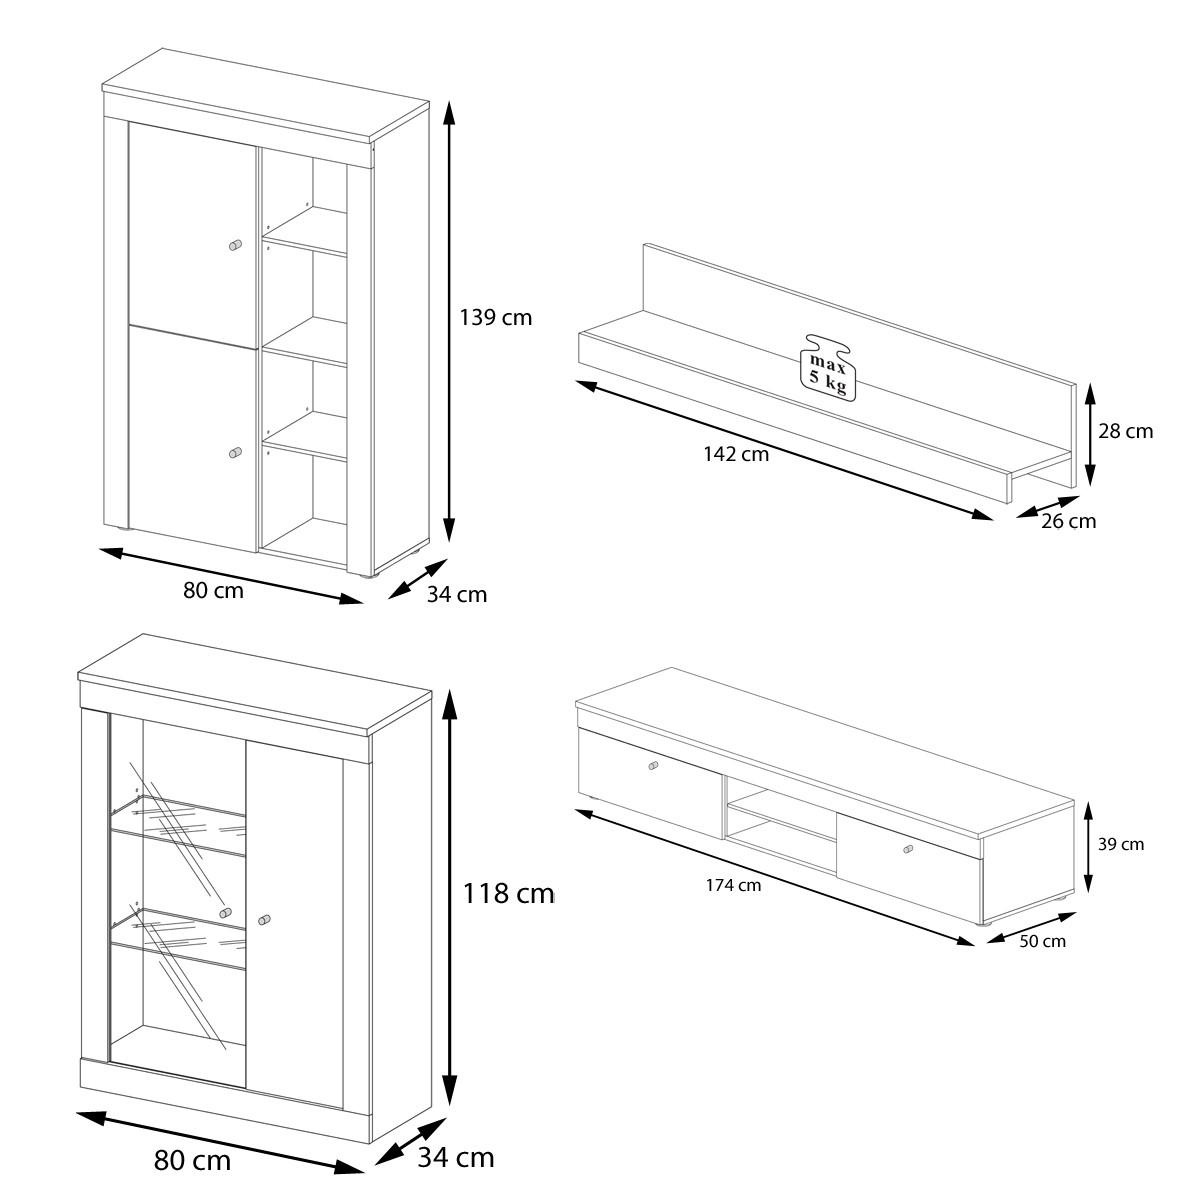 wohnwand freedom i in sonoma eiche wei. Black Bedroom Furniture Sets. Home Design Ideas